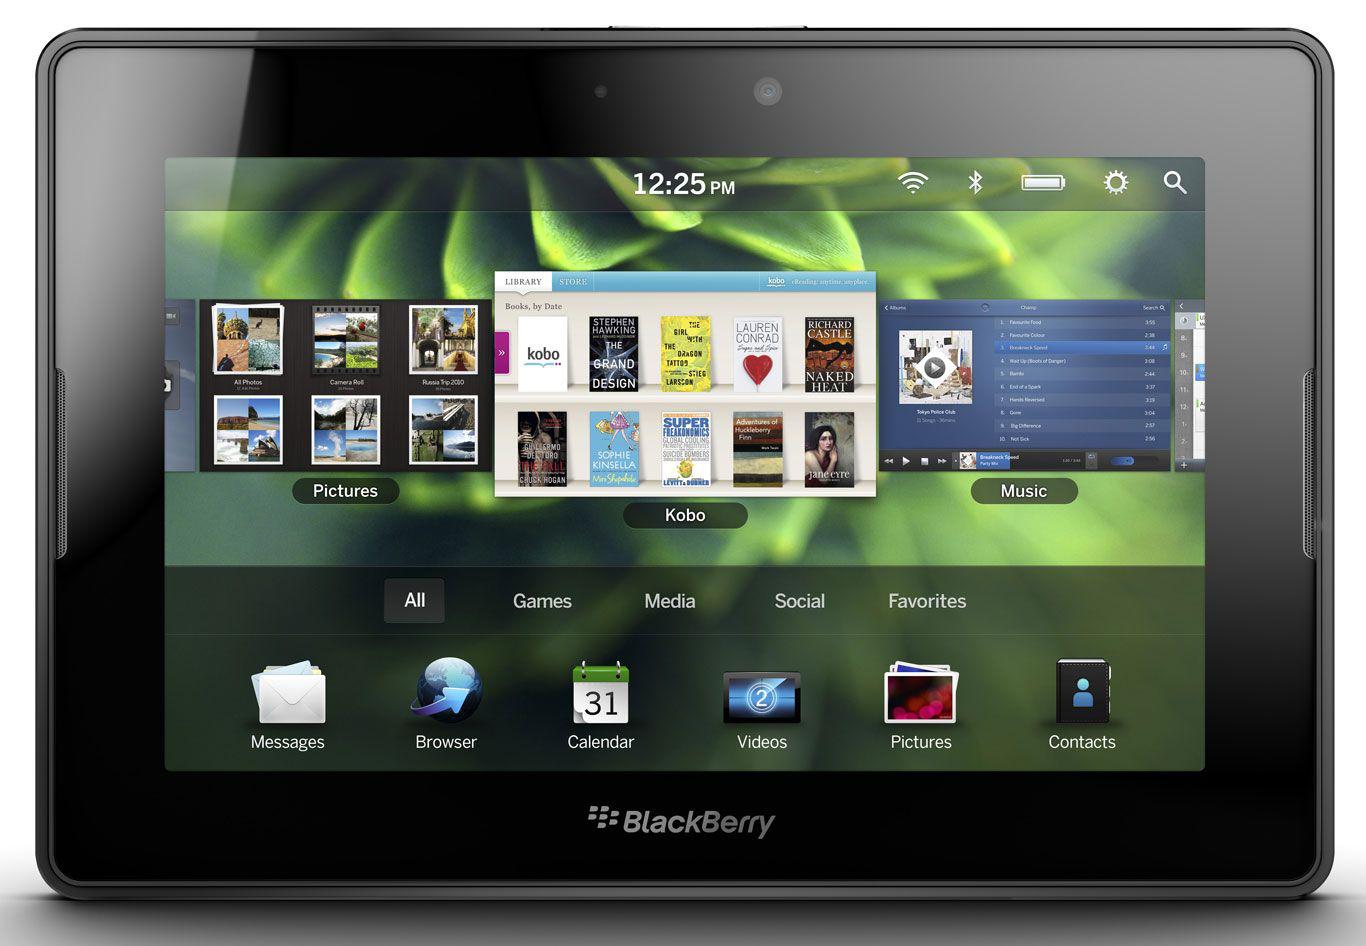 Tablette Blackberry Playbook 7'' 64 Go (Version UK) - Reconditionné (Grade B)